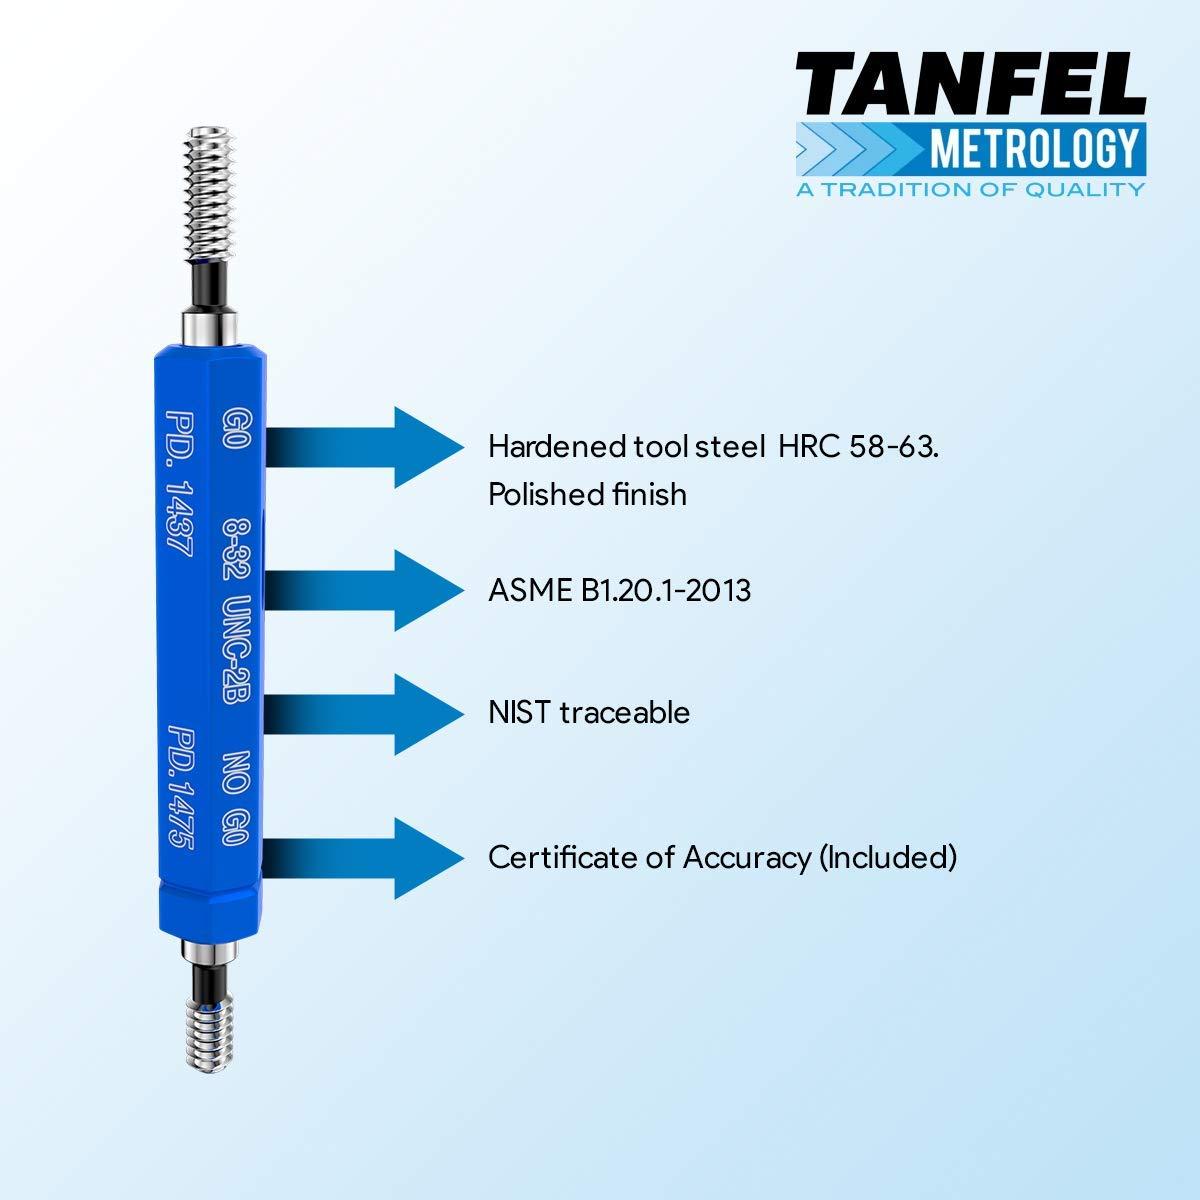 Tanfel #8-32 UNC-2B Taperlock GO NOGO Thread Plug Gage Certified Gauge